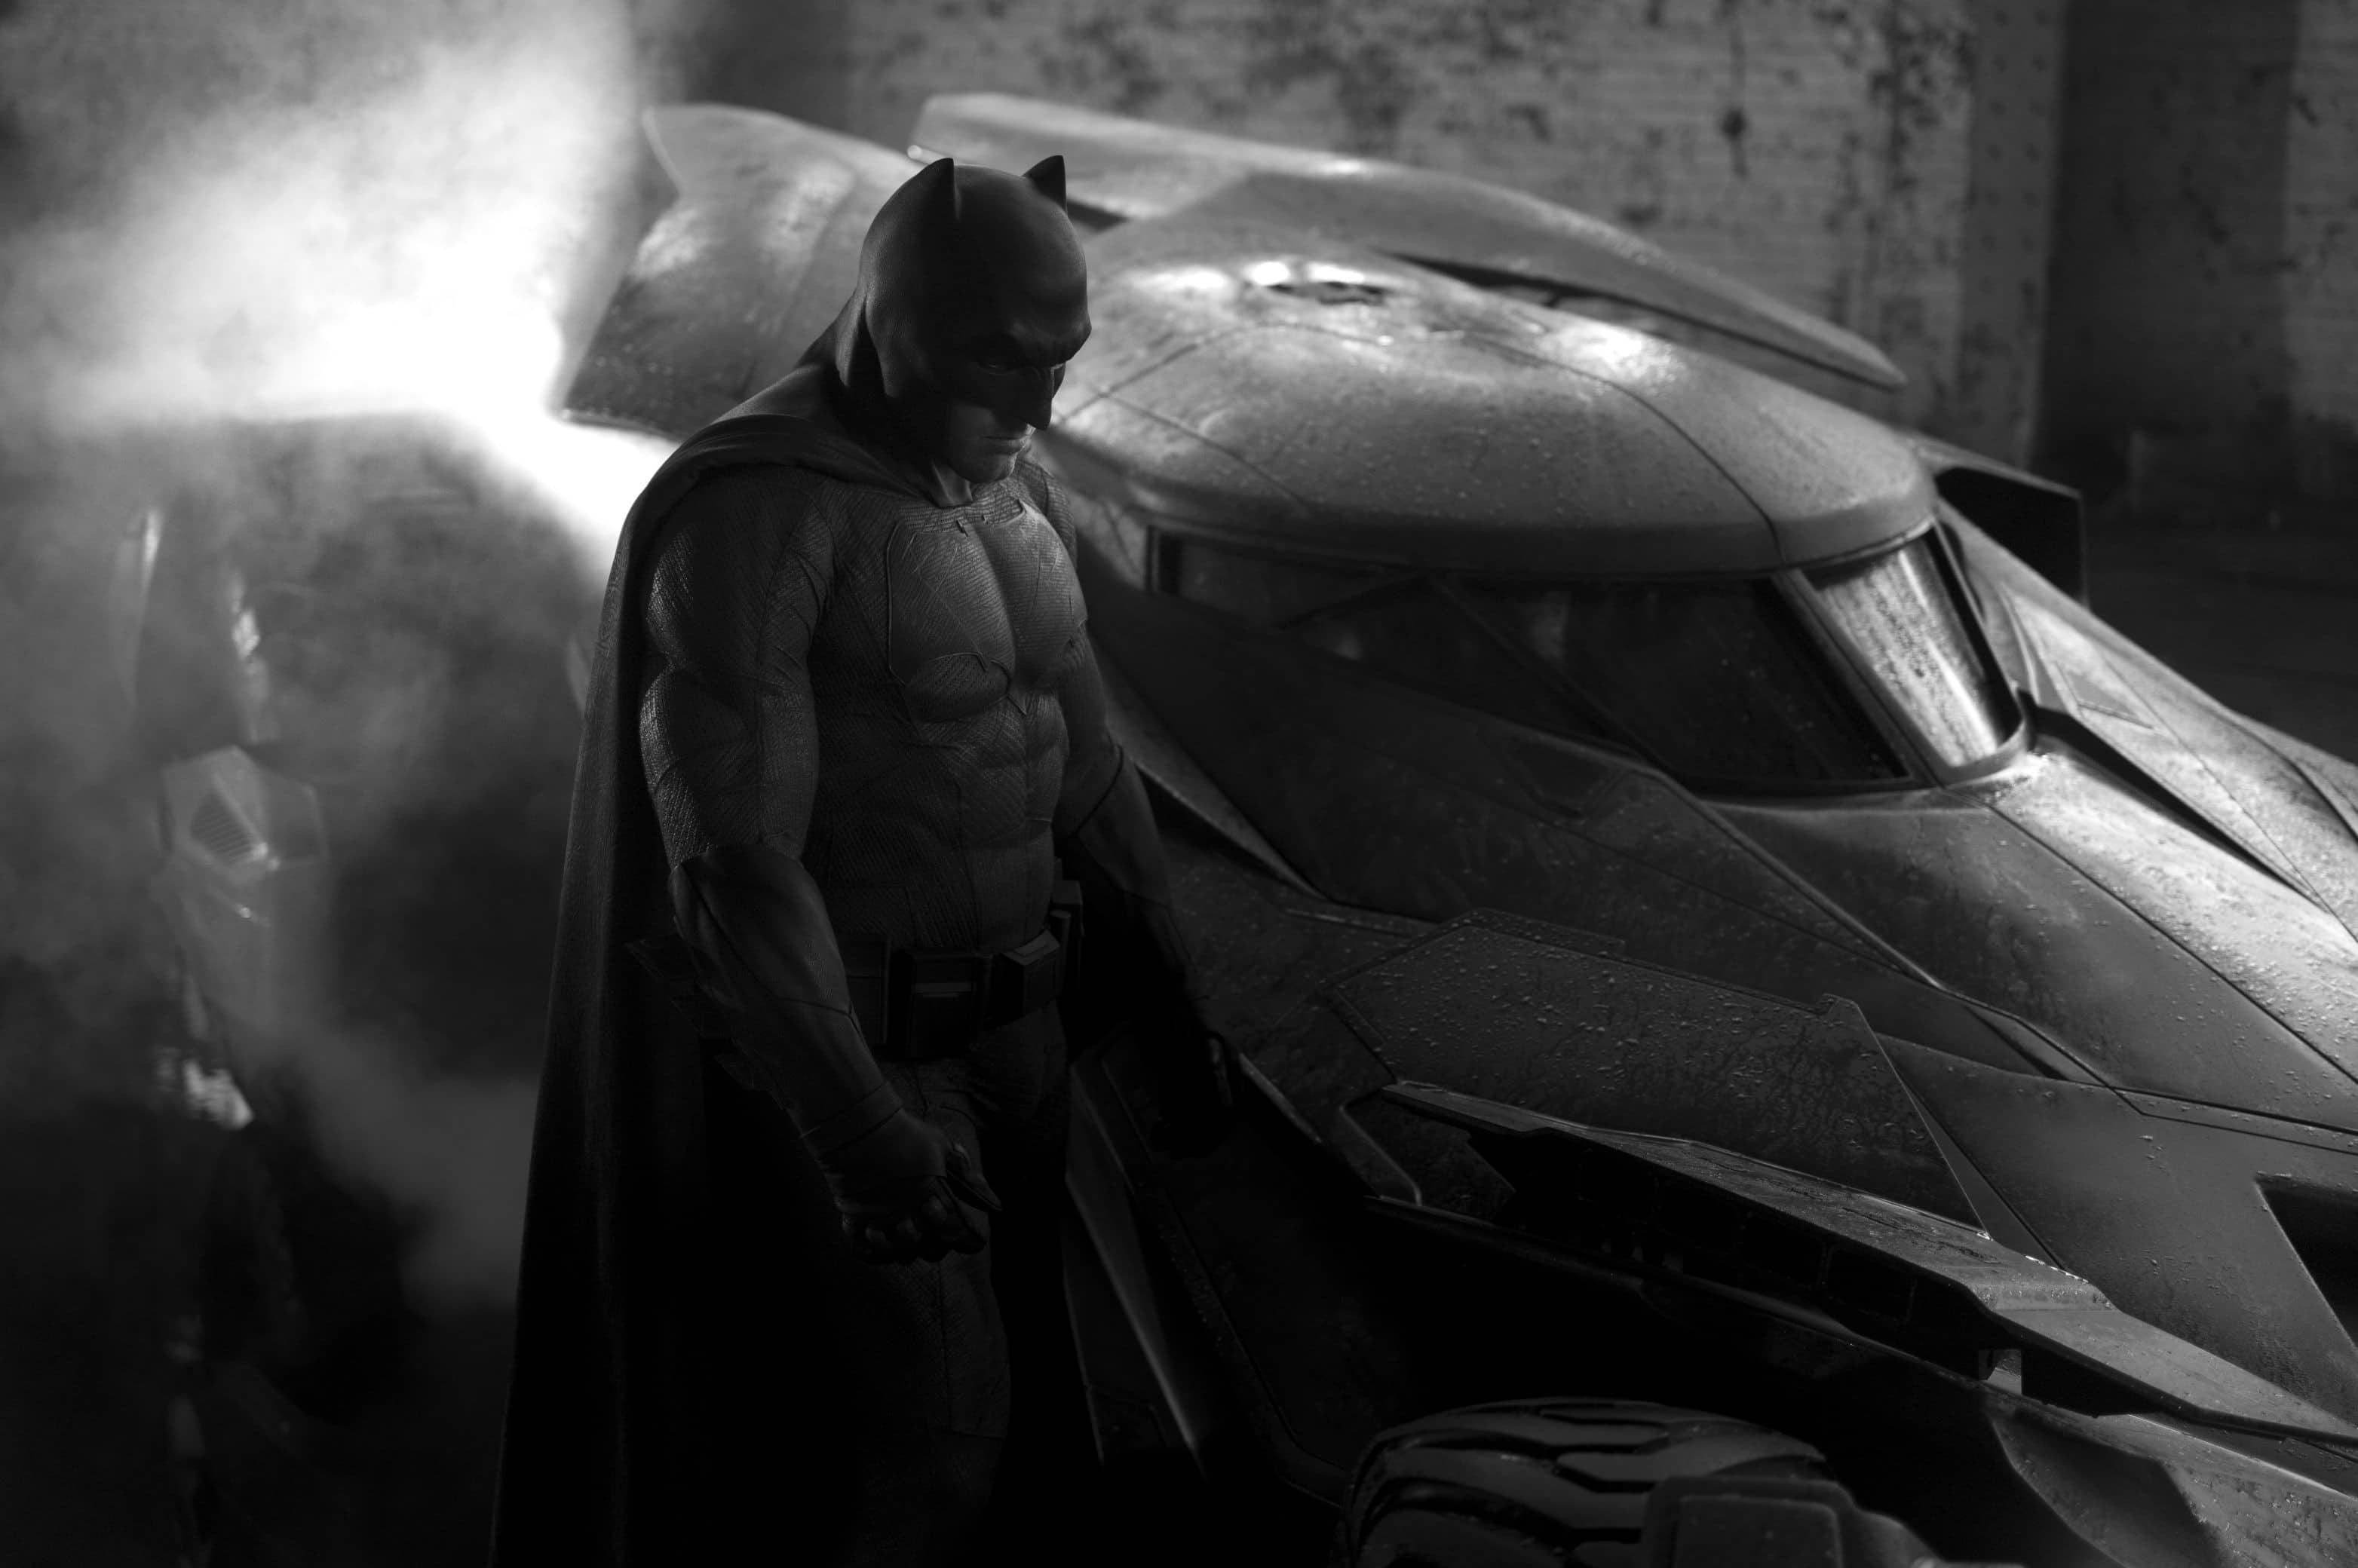 Batman-Vs-Superman-2016-Movie-Picture-02